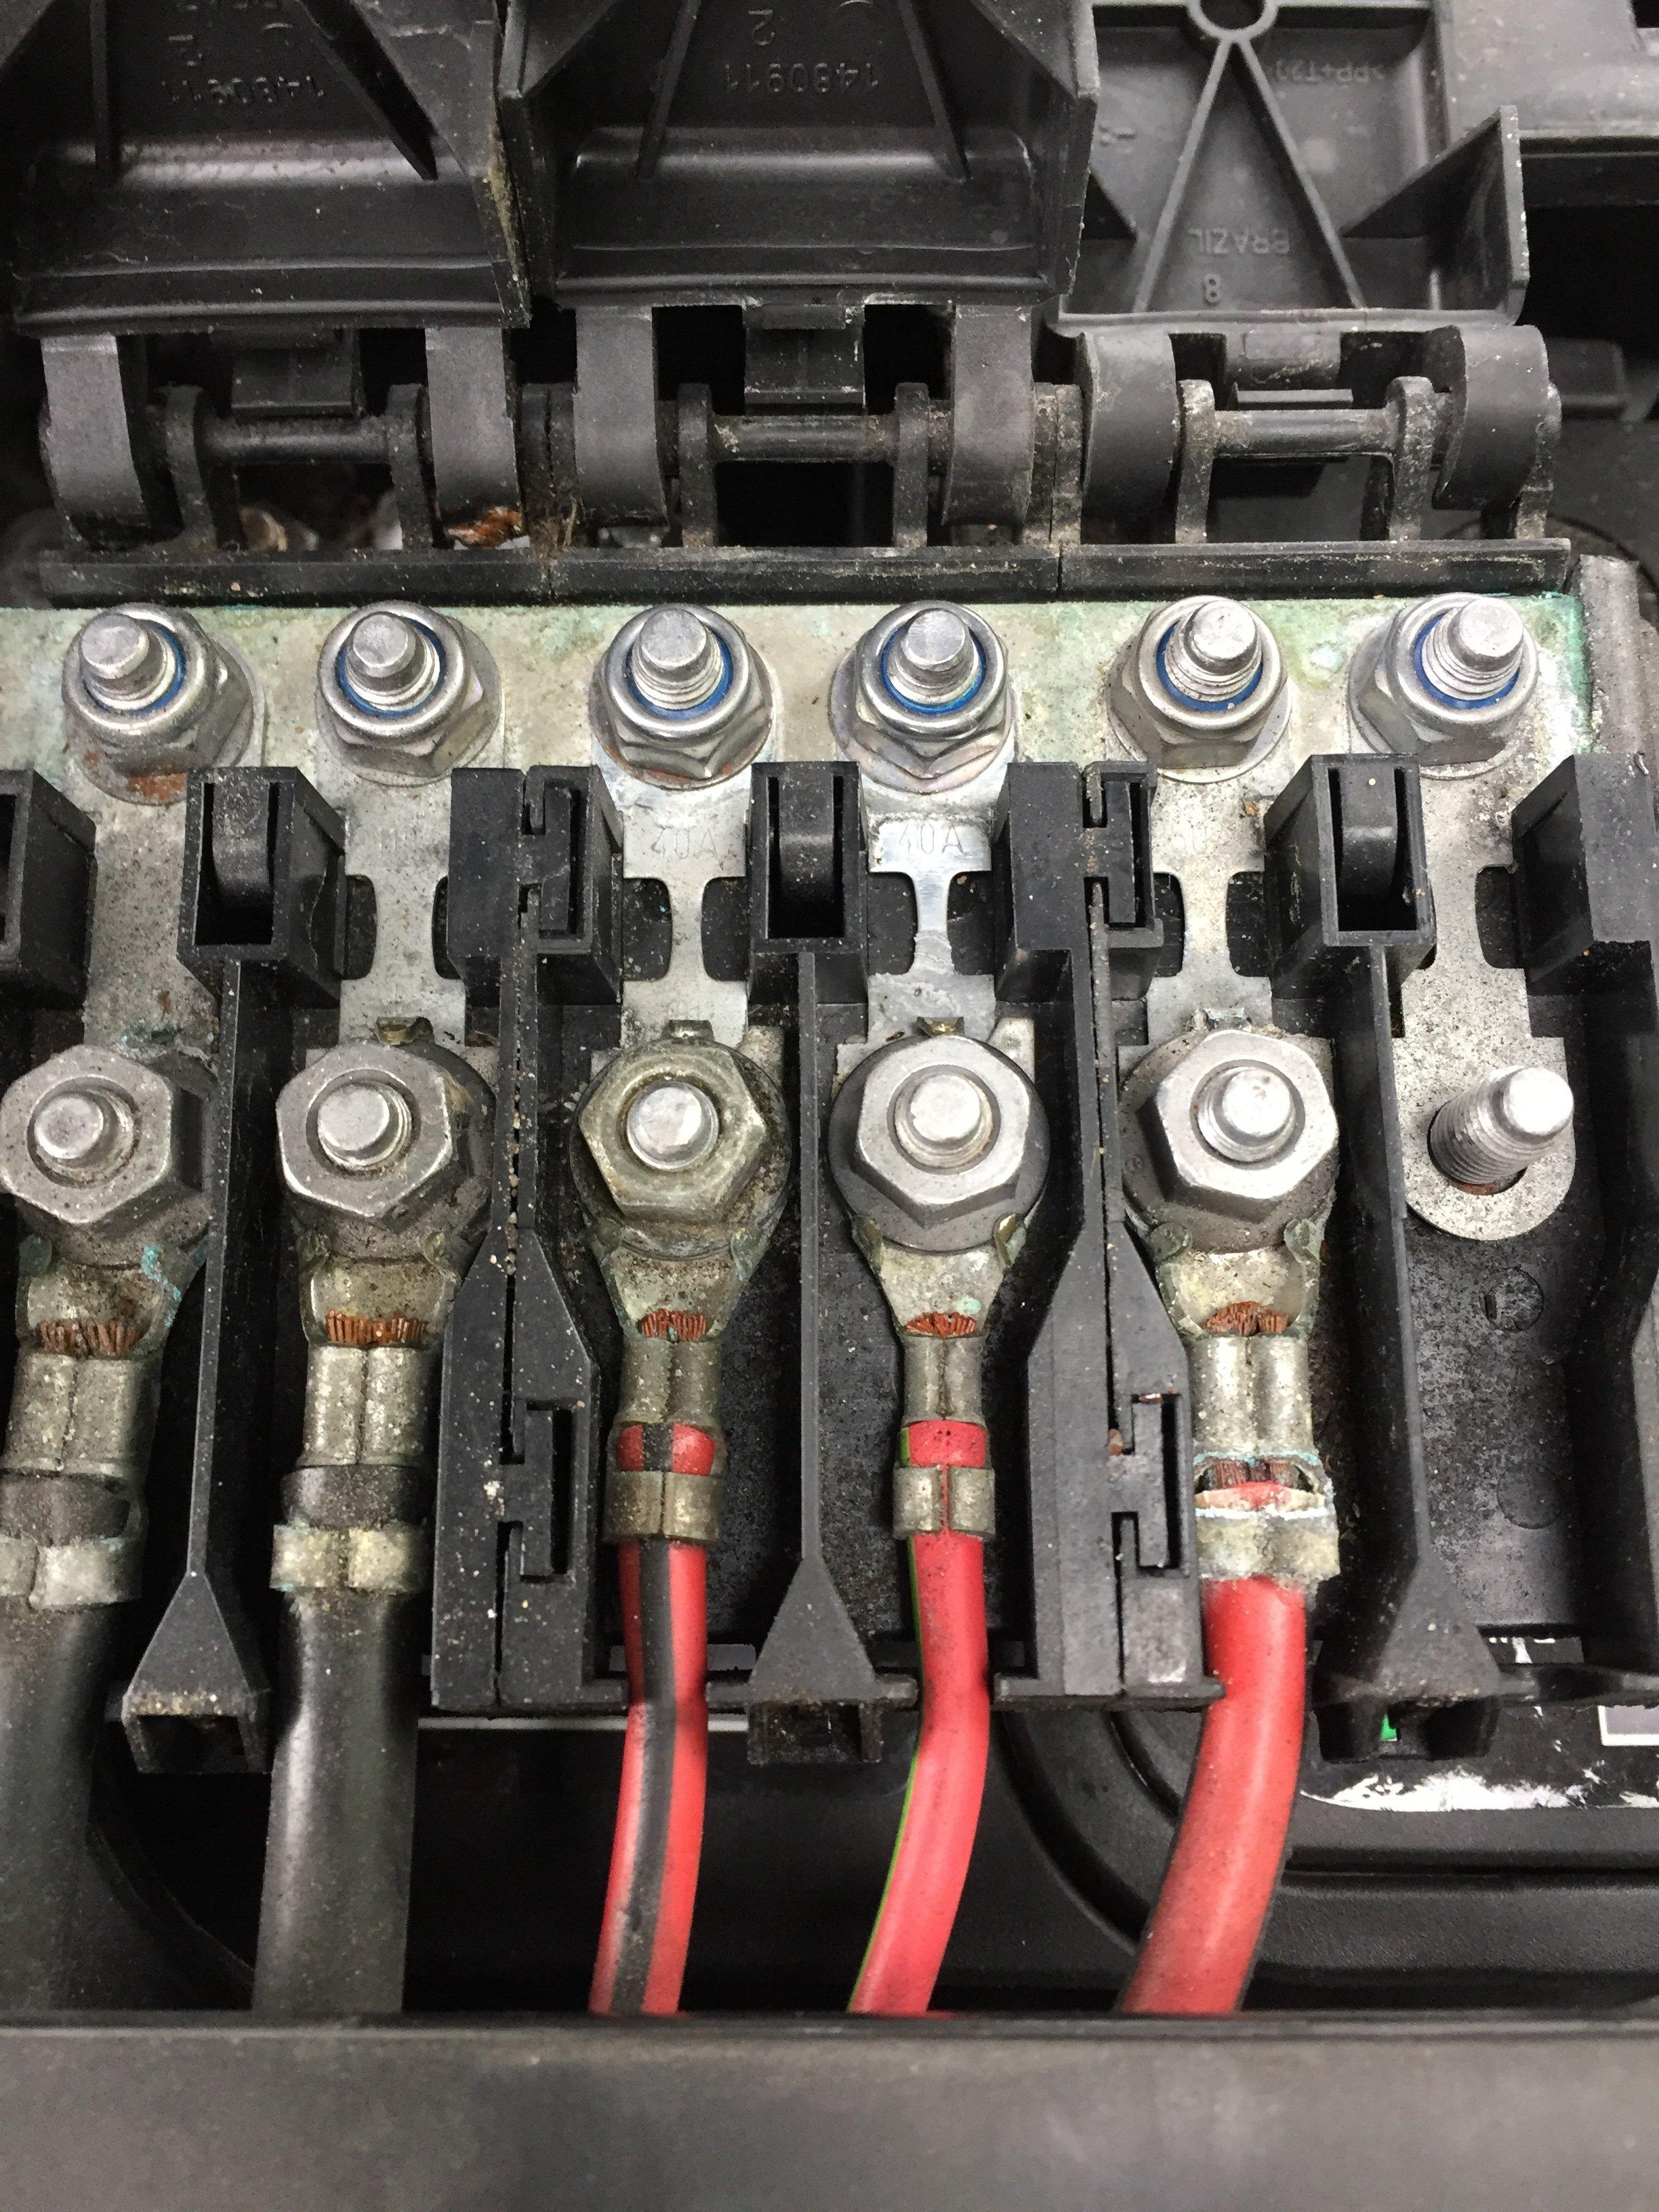 skoda octavia towbar wiring diagram parts of a cruise ship 2001 fabia library